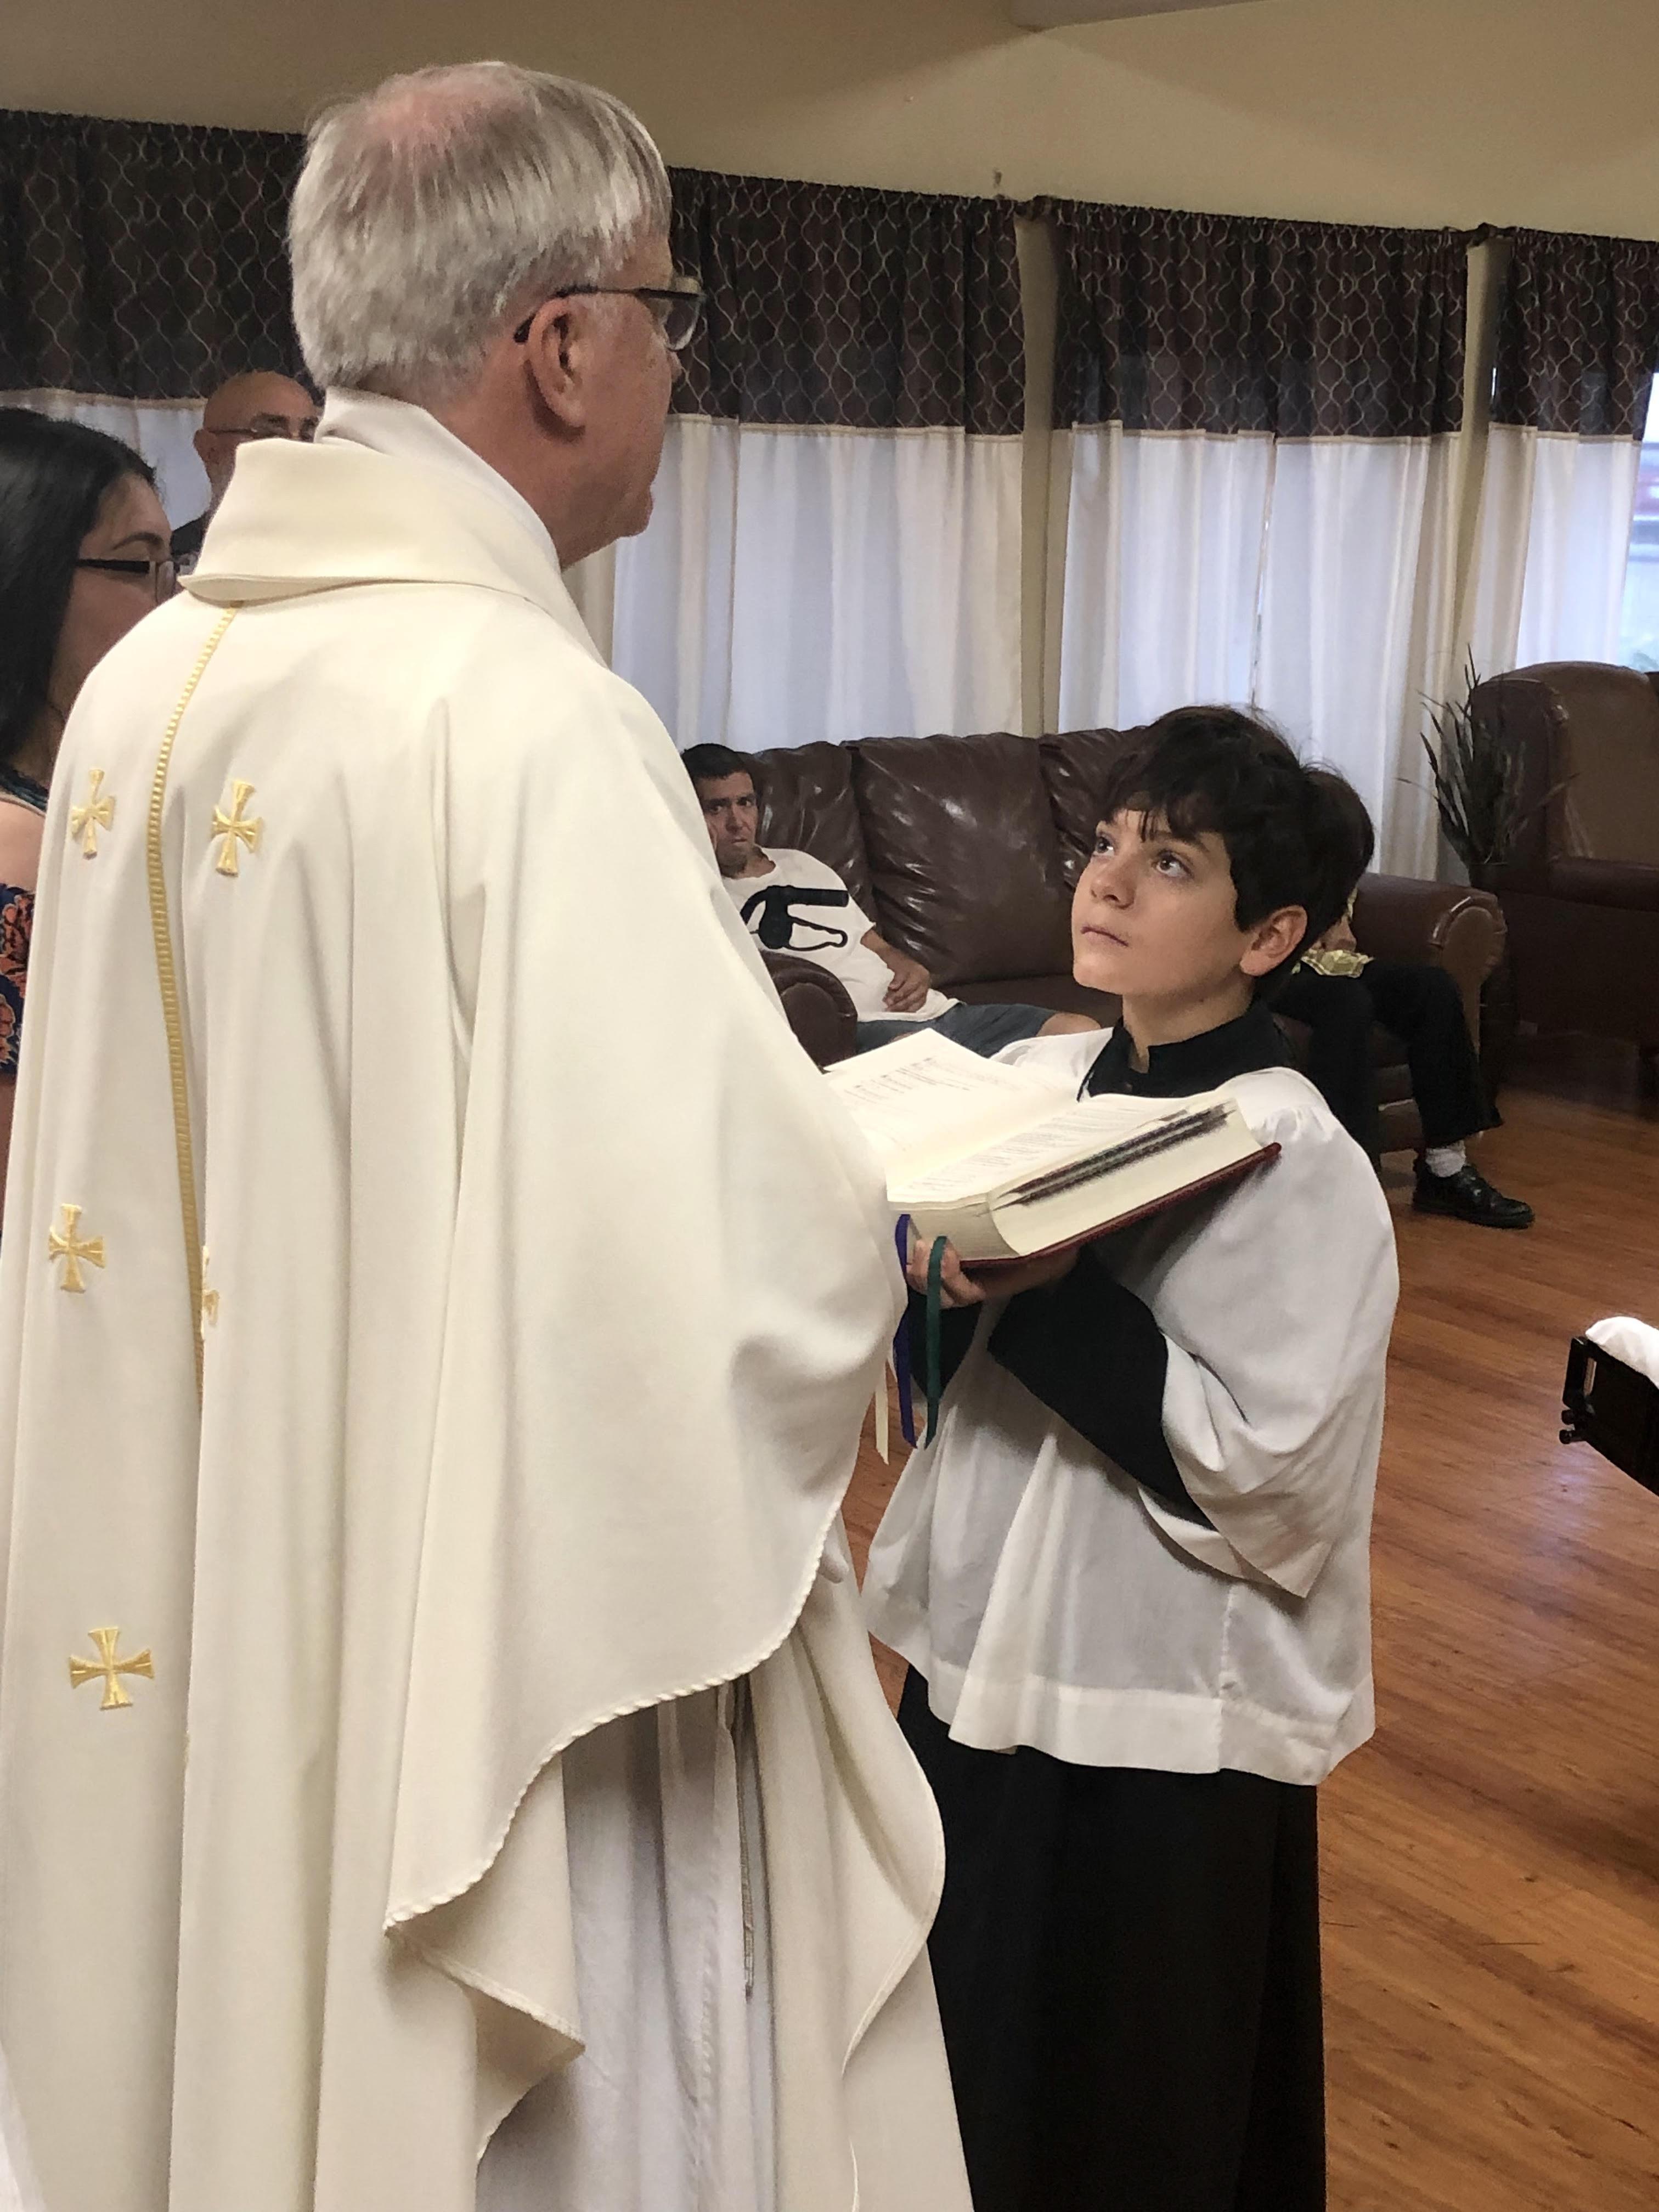 Mass at the Nursing Home